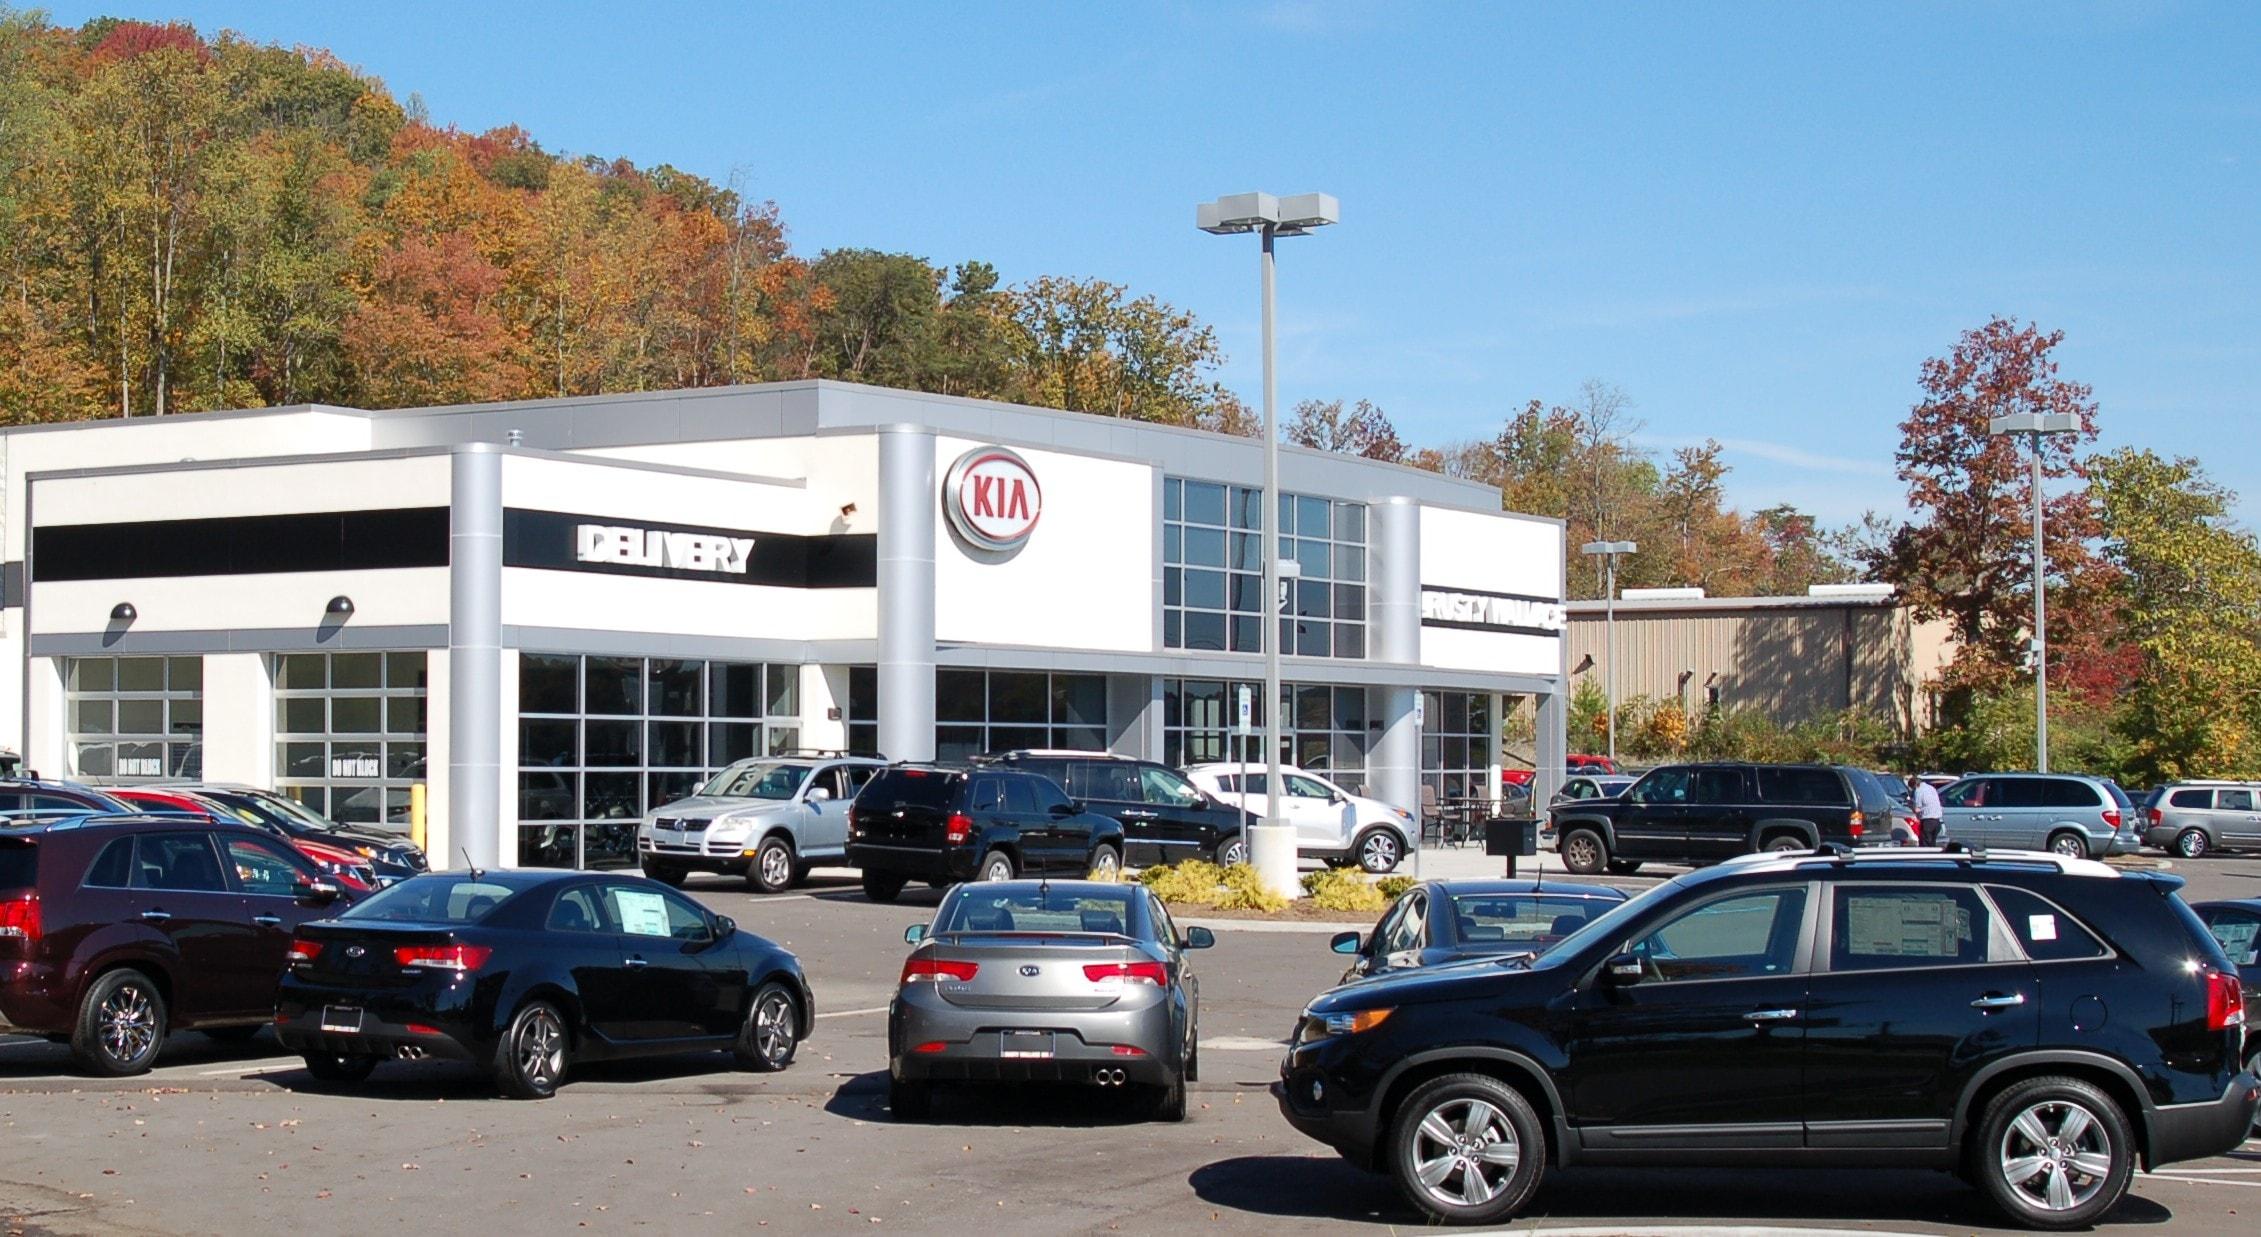 Kia Dealership Knoxville 28 Images Roadrunner Motors